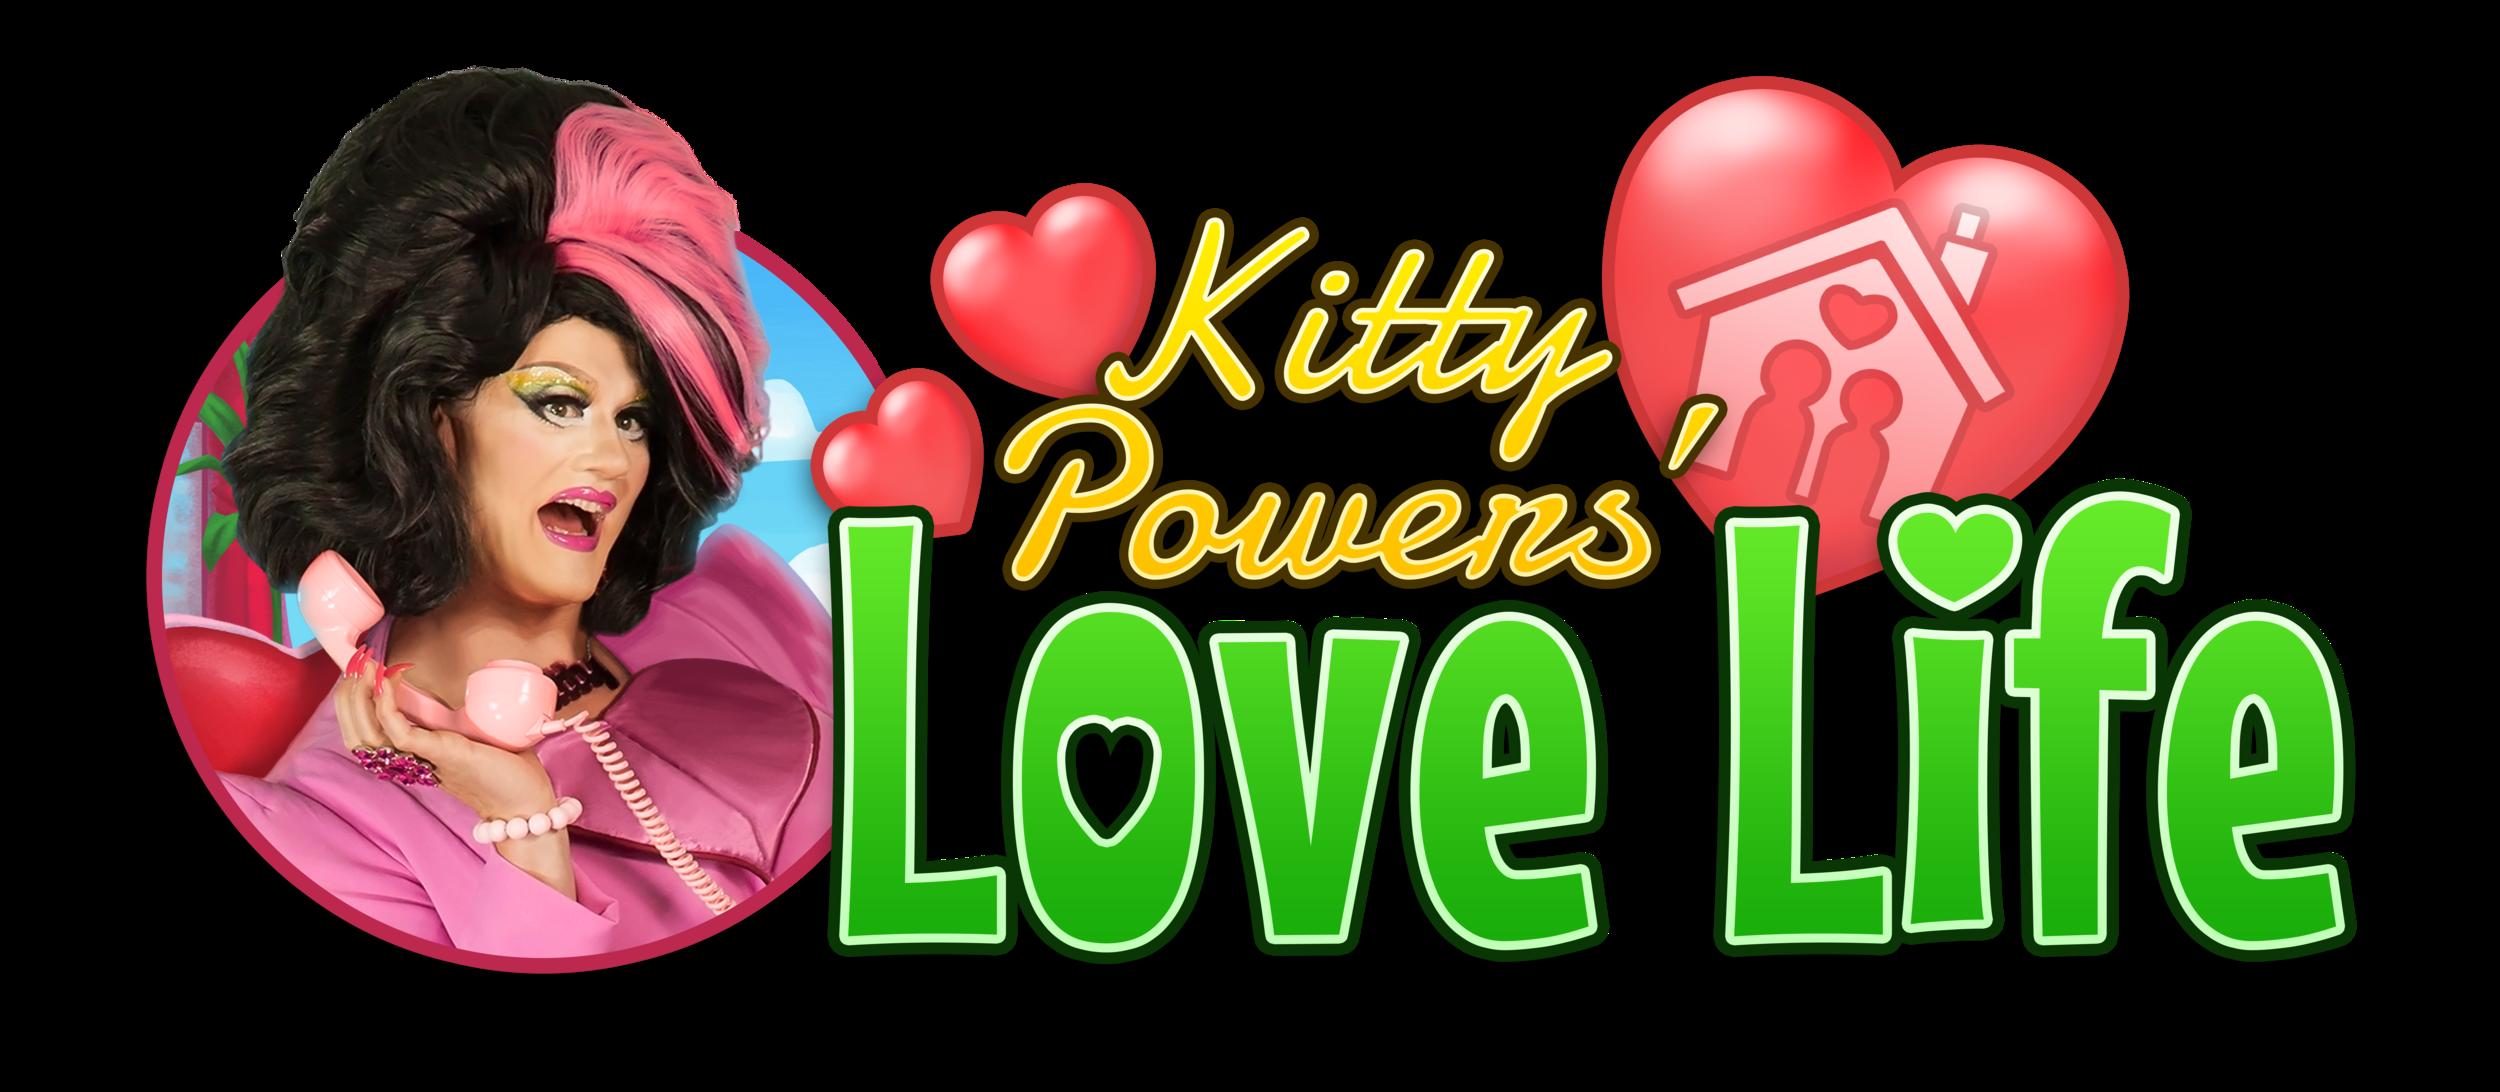 Love Life Logo with Kitty